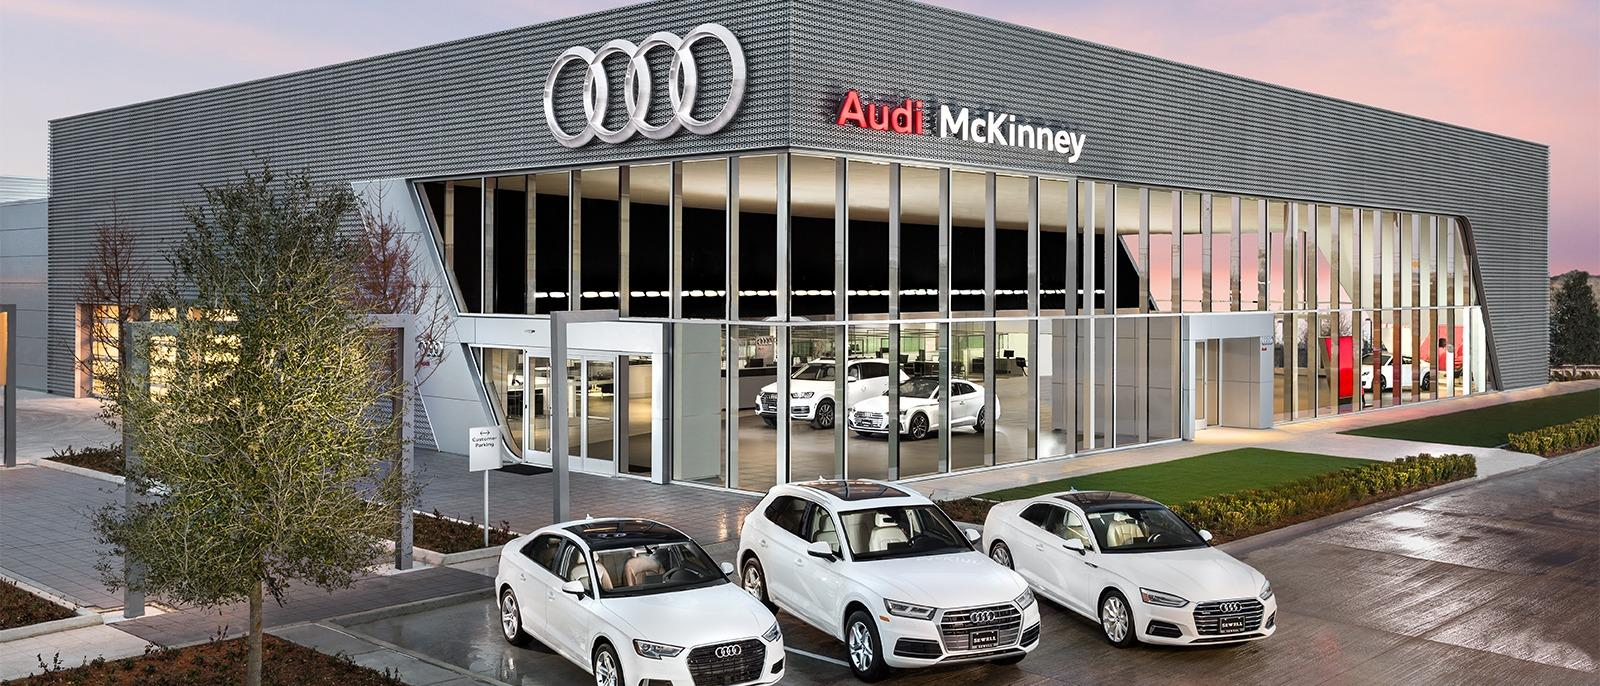 Sewell Audi McKinney